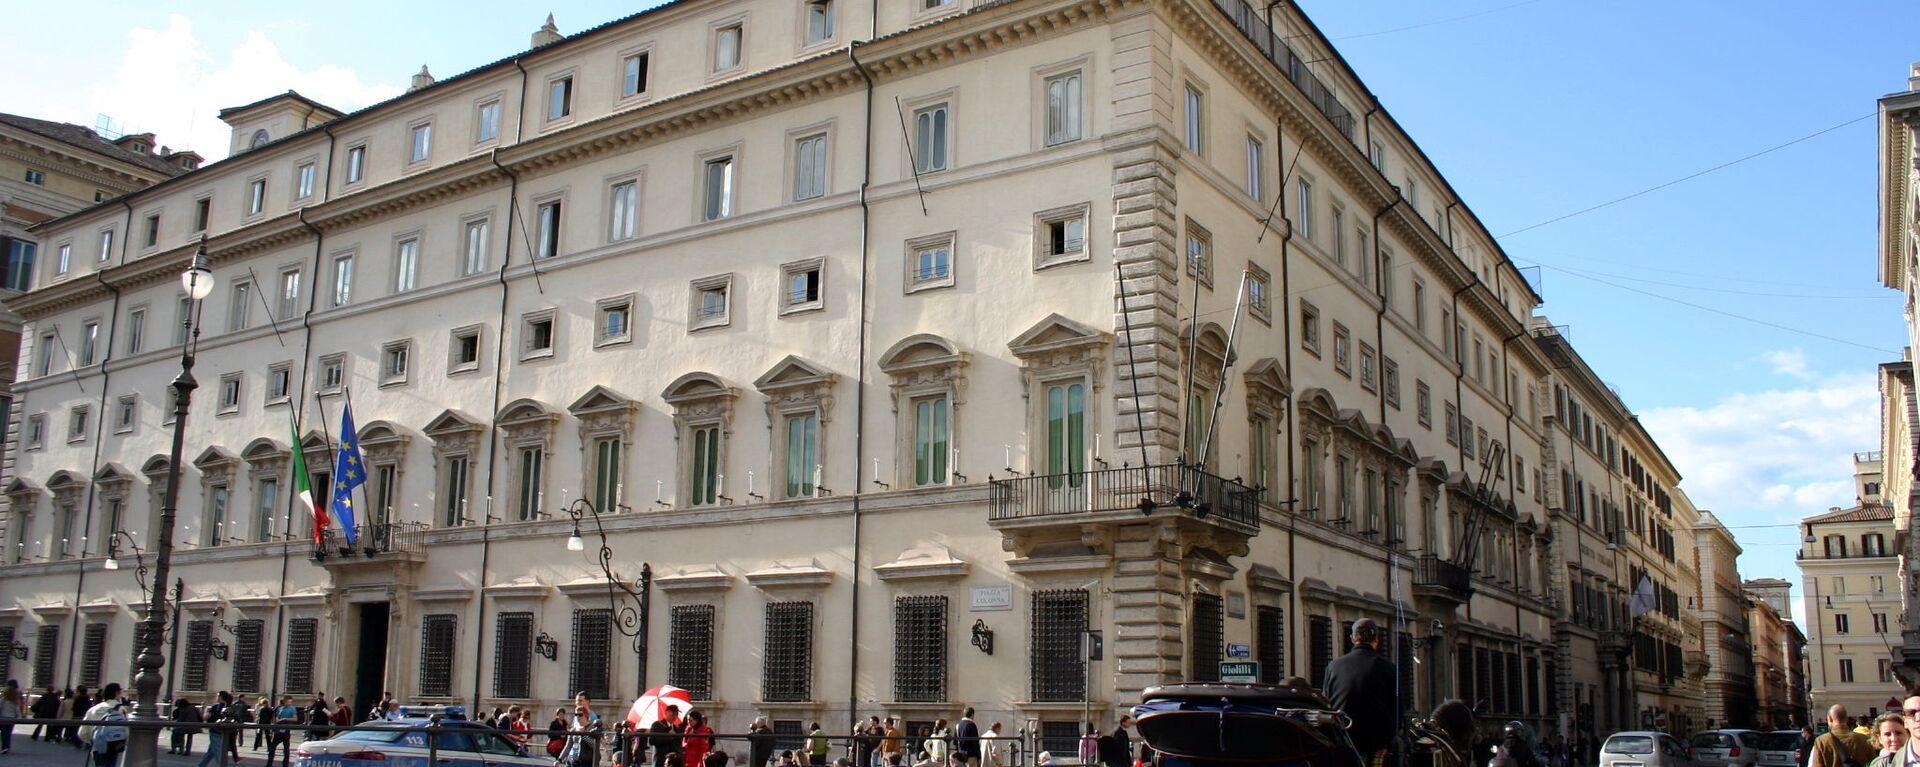 Il Palazzo Chigi - Sputnik Italia, 1920, 07.05.2021